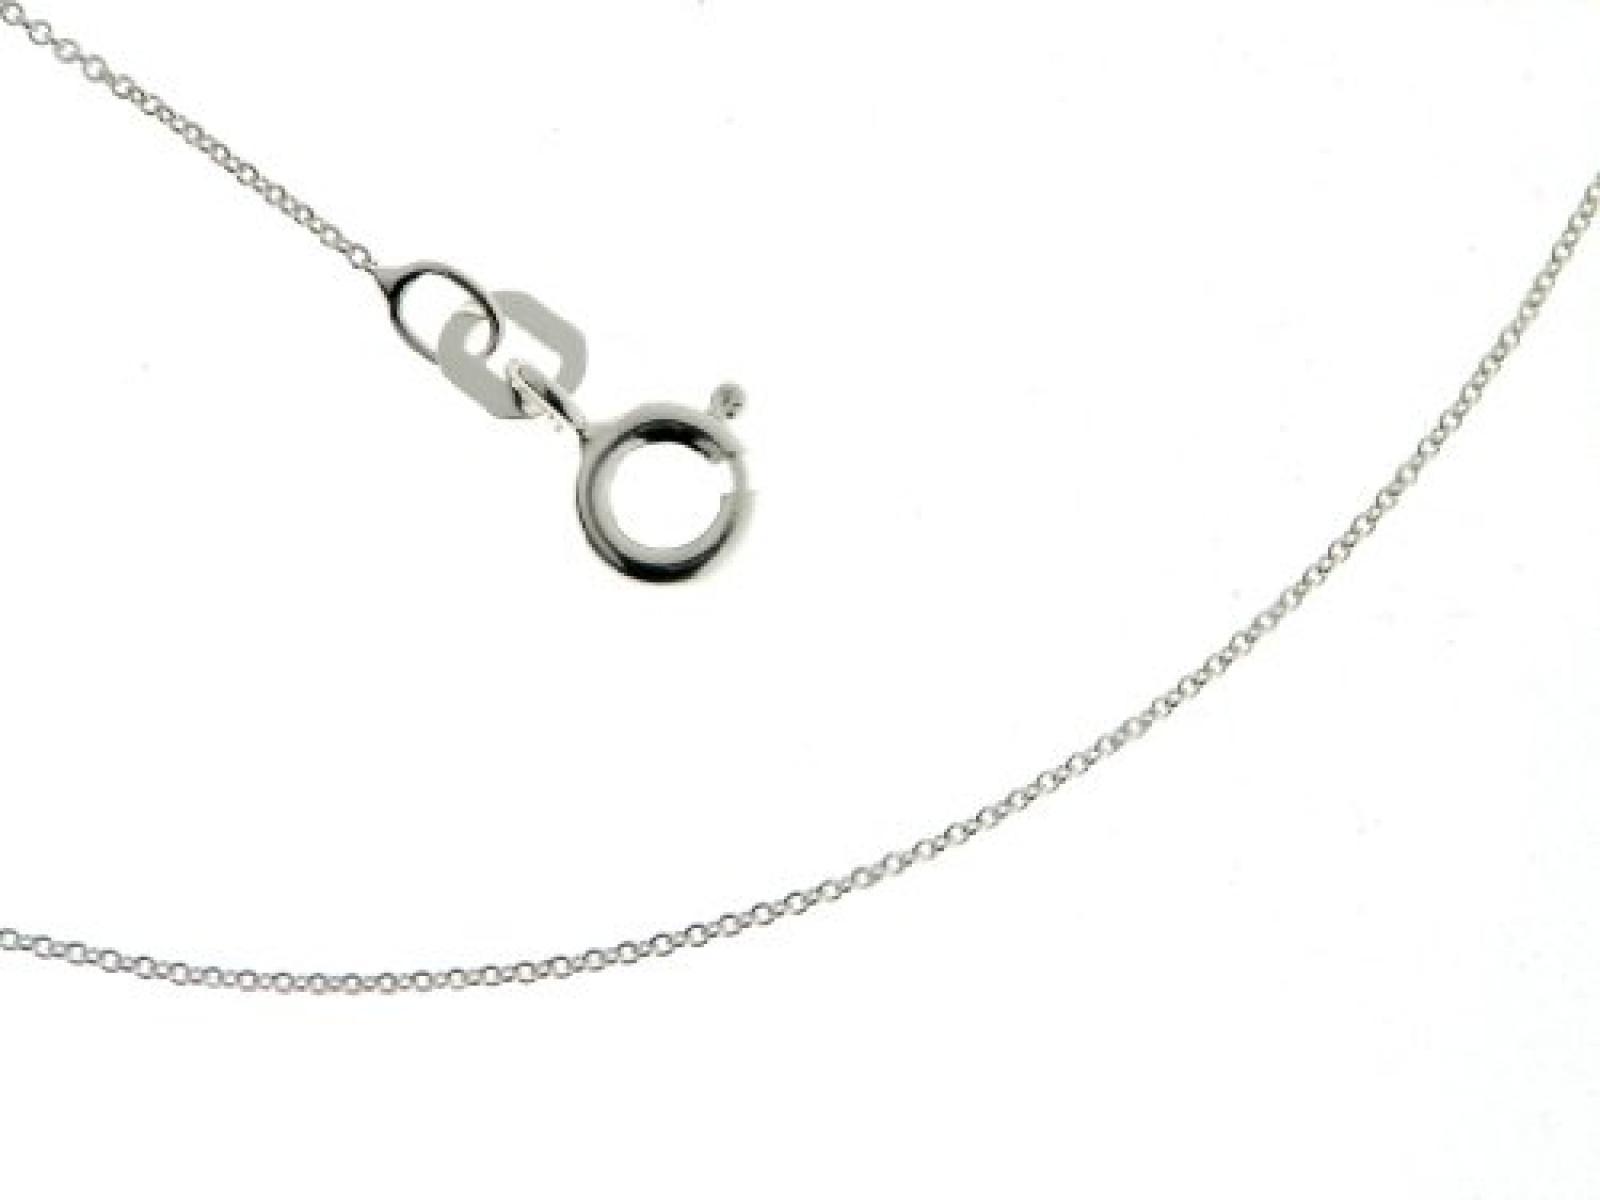 BOB C. Damen-Halskette ohne Anhänger Anker 925 Sterling Silber 326881